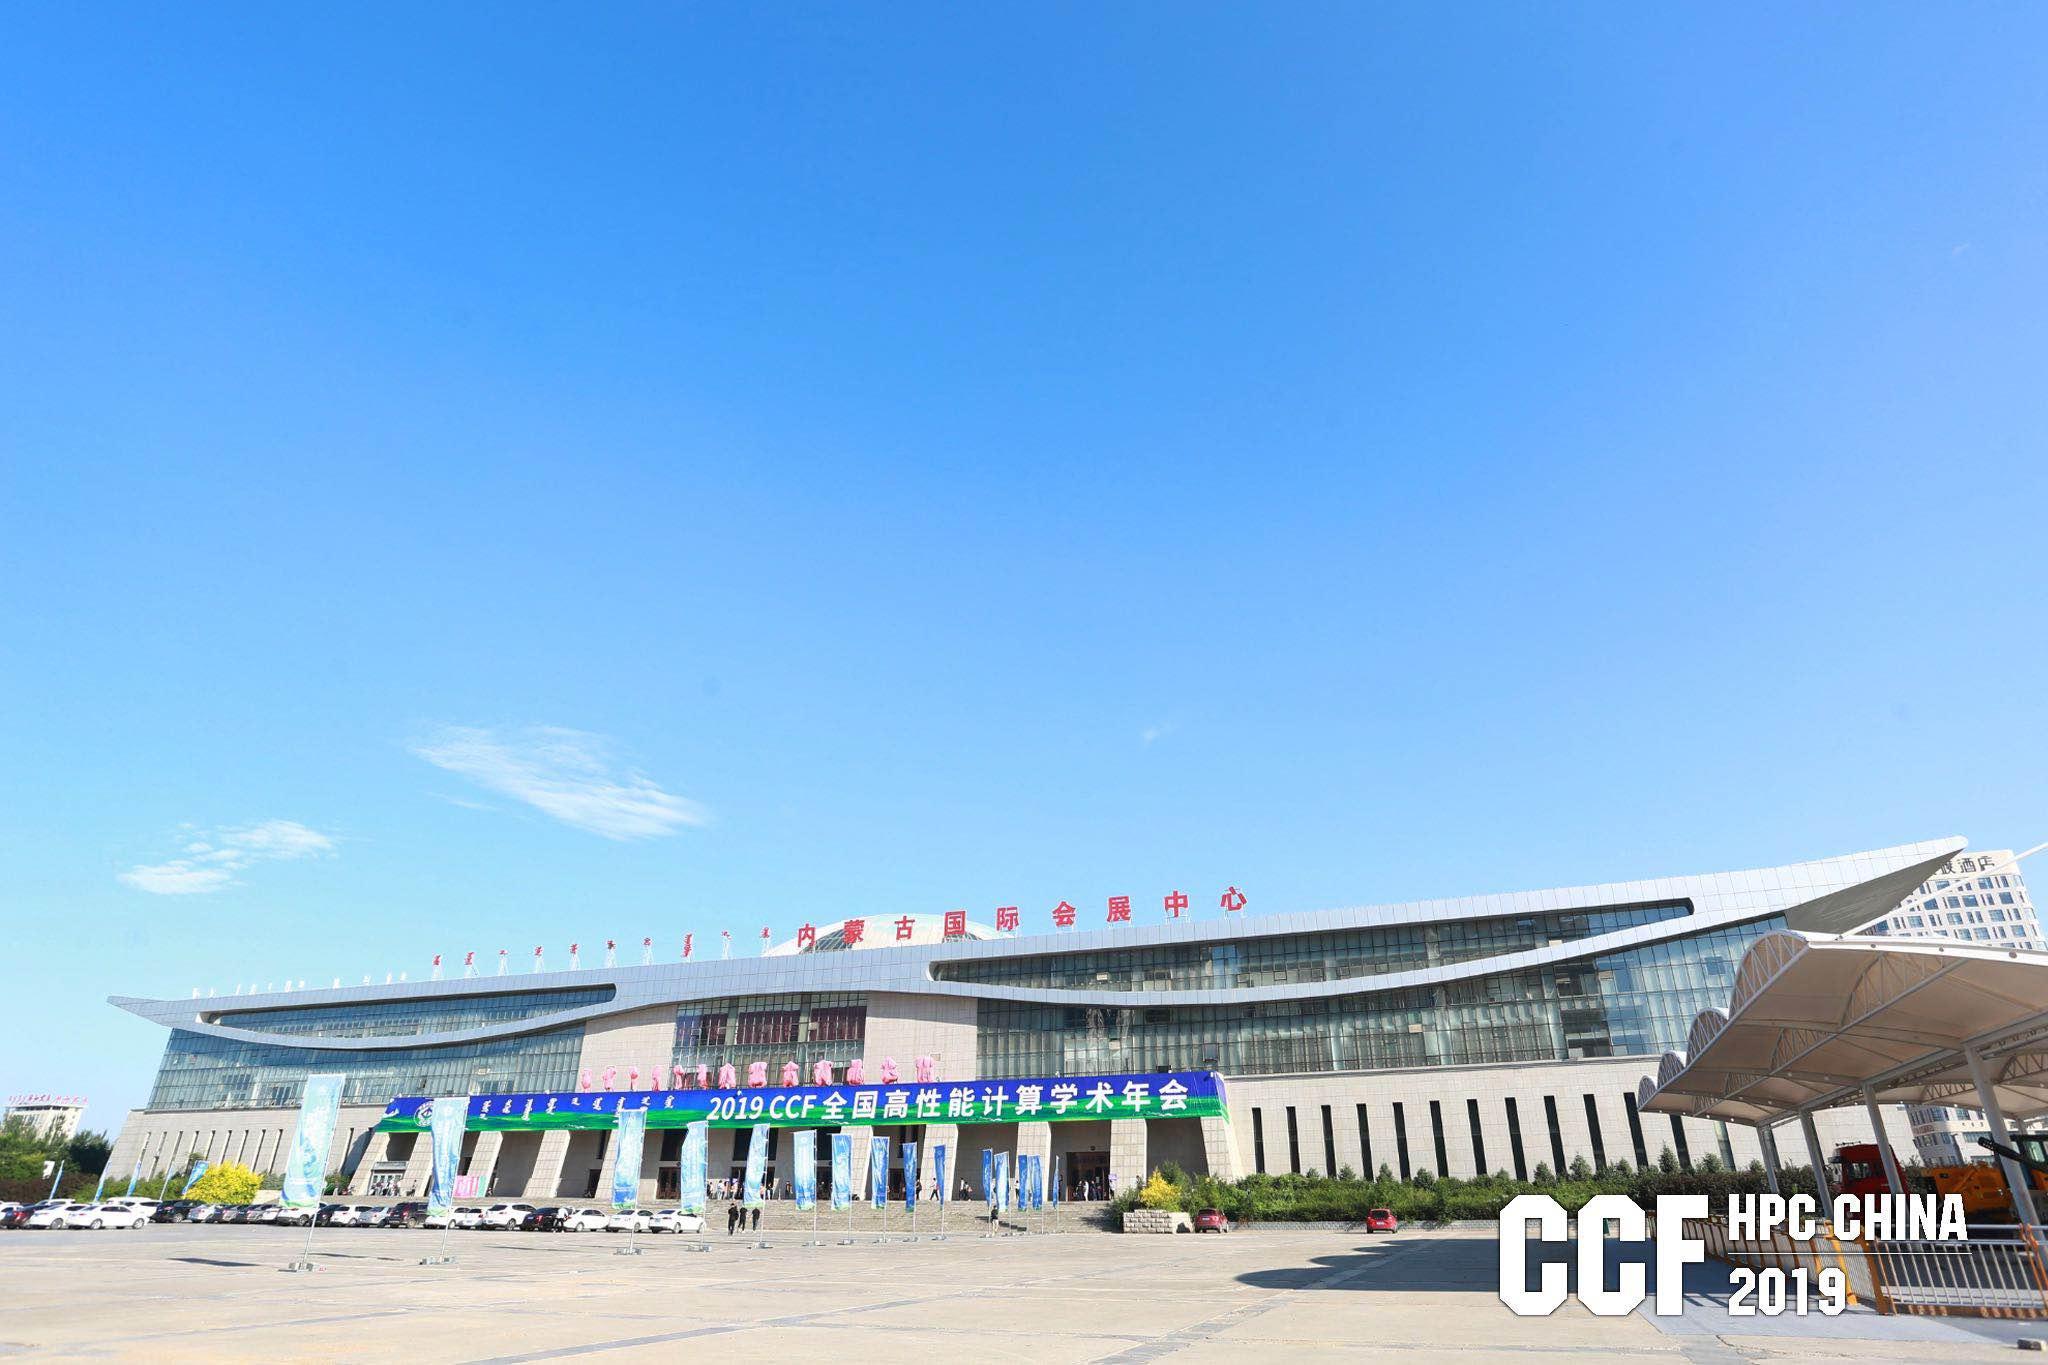 HPC CHINA 2019:面向E级计算时代的HPC/AI协同设计